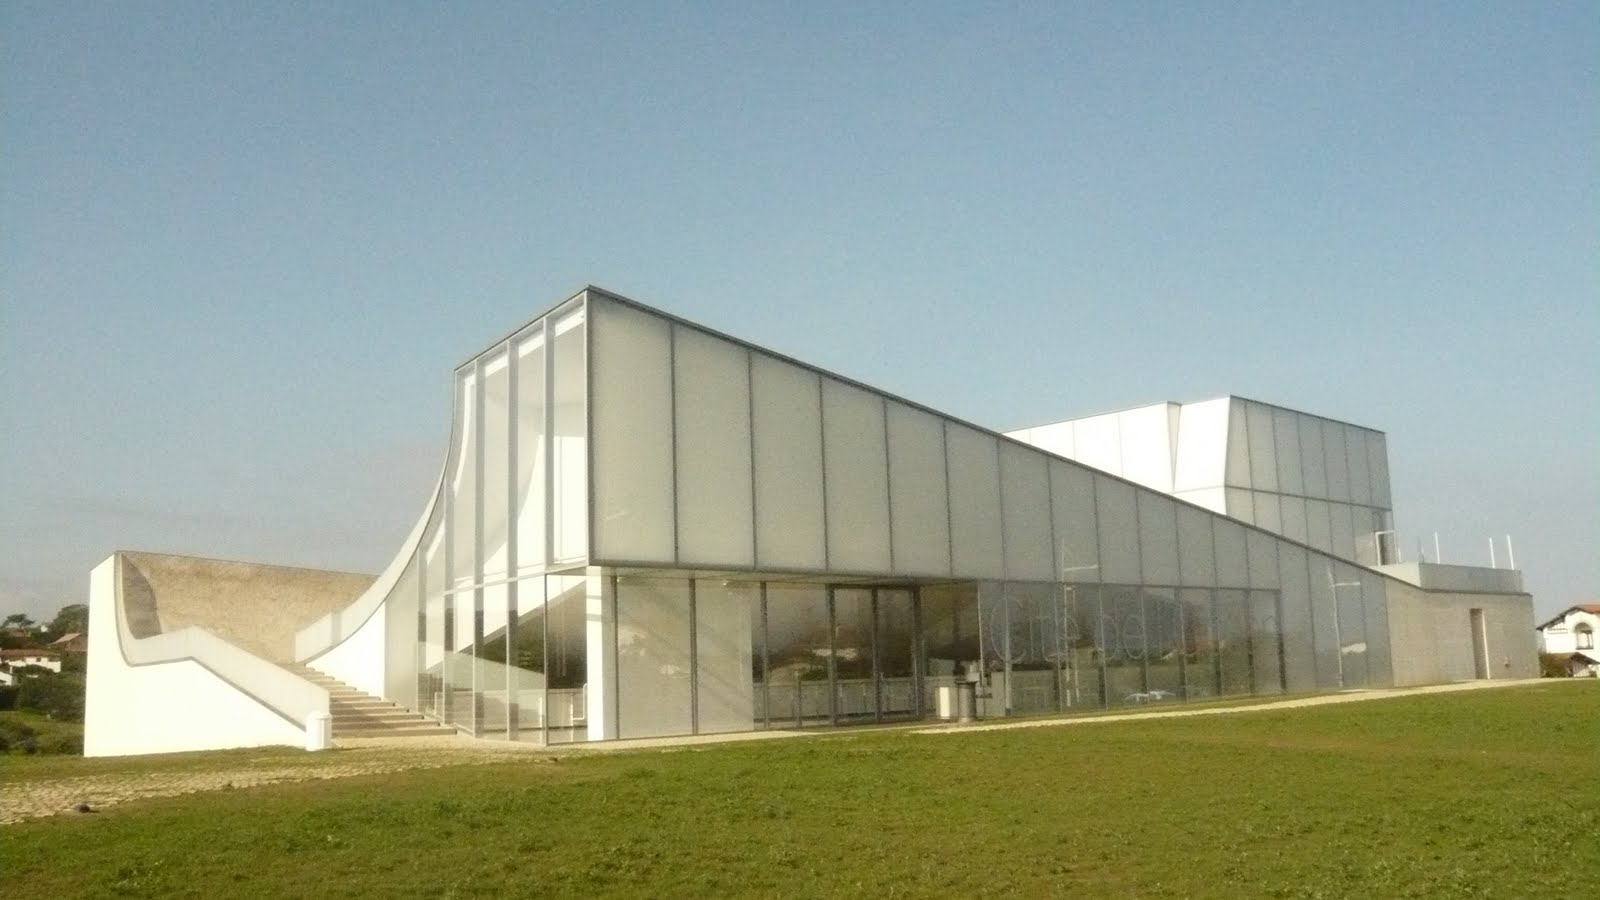 #706C26 Inova Vidros: Vidro & Arquitetura Obras Incríveis 1580 Vidros Janelas Fortaleza